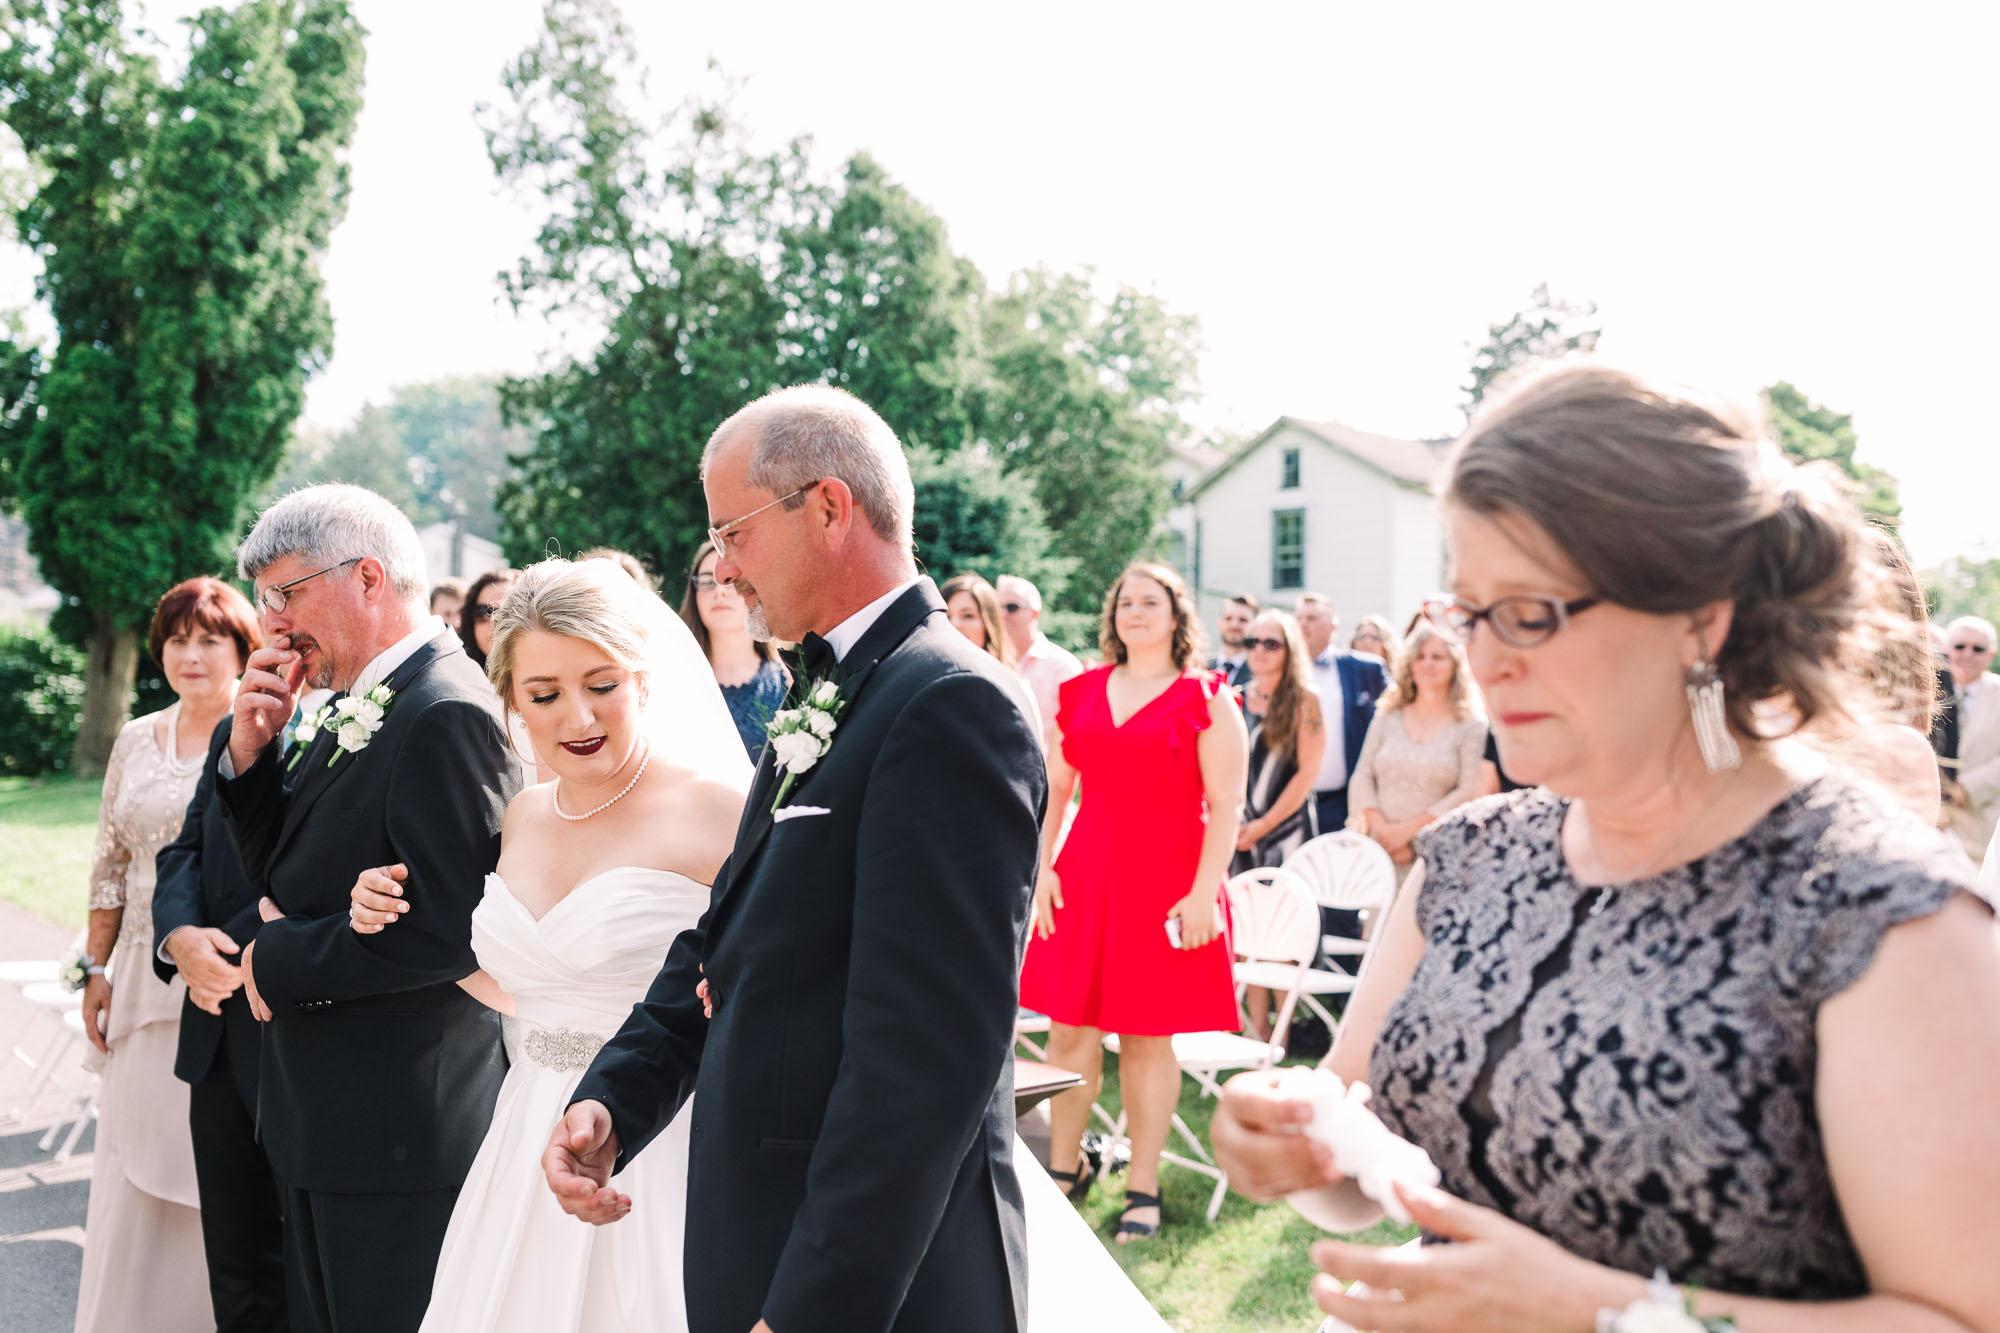 isle-of-que-wedding-6714.jpg